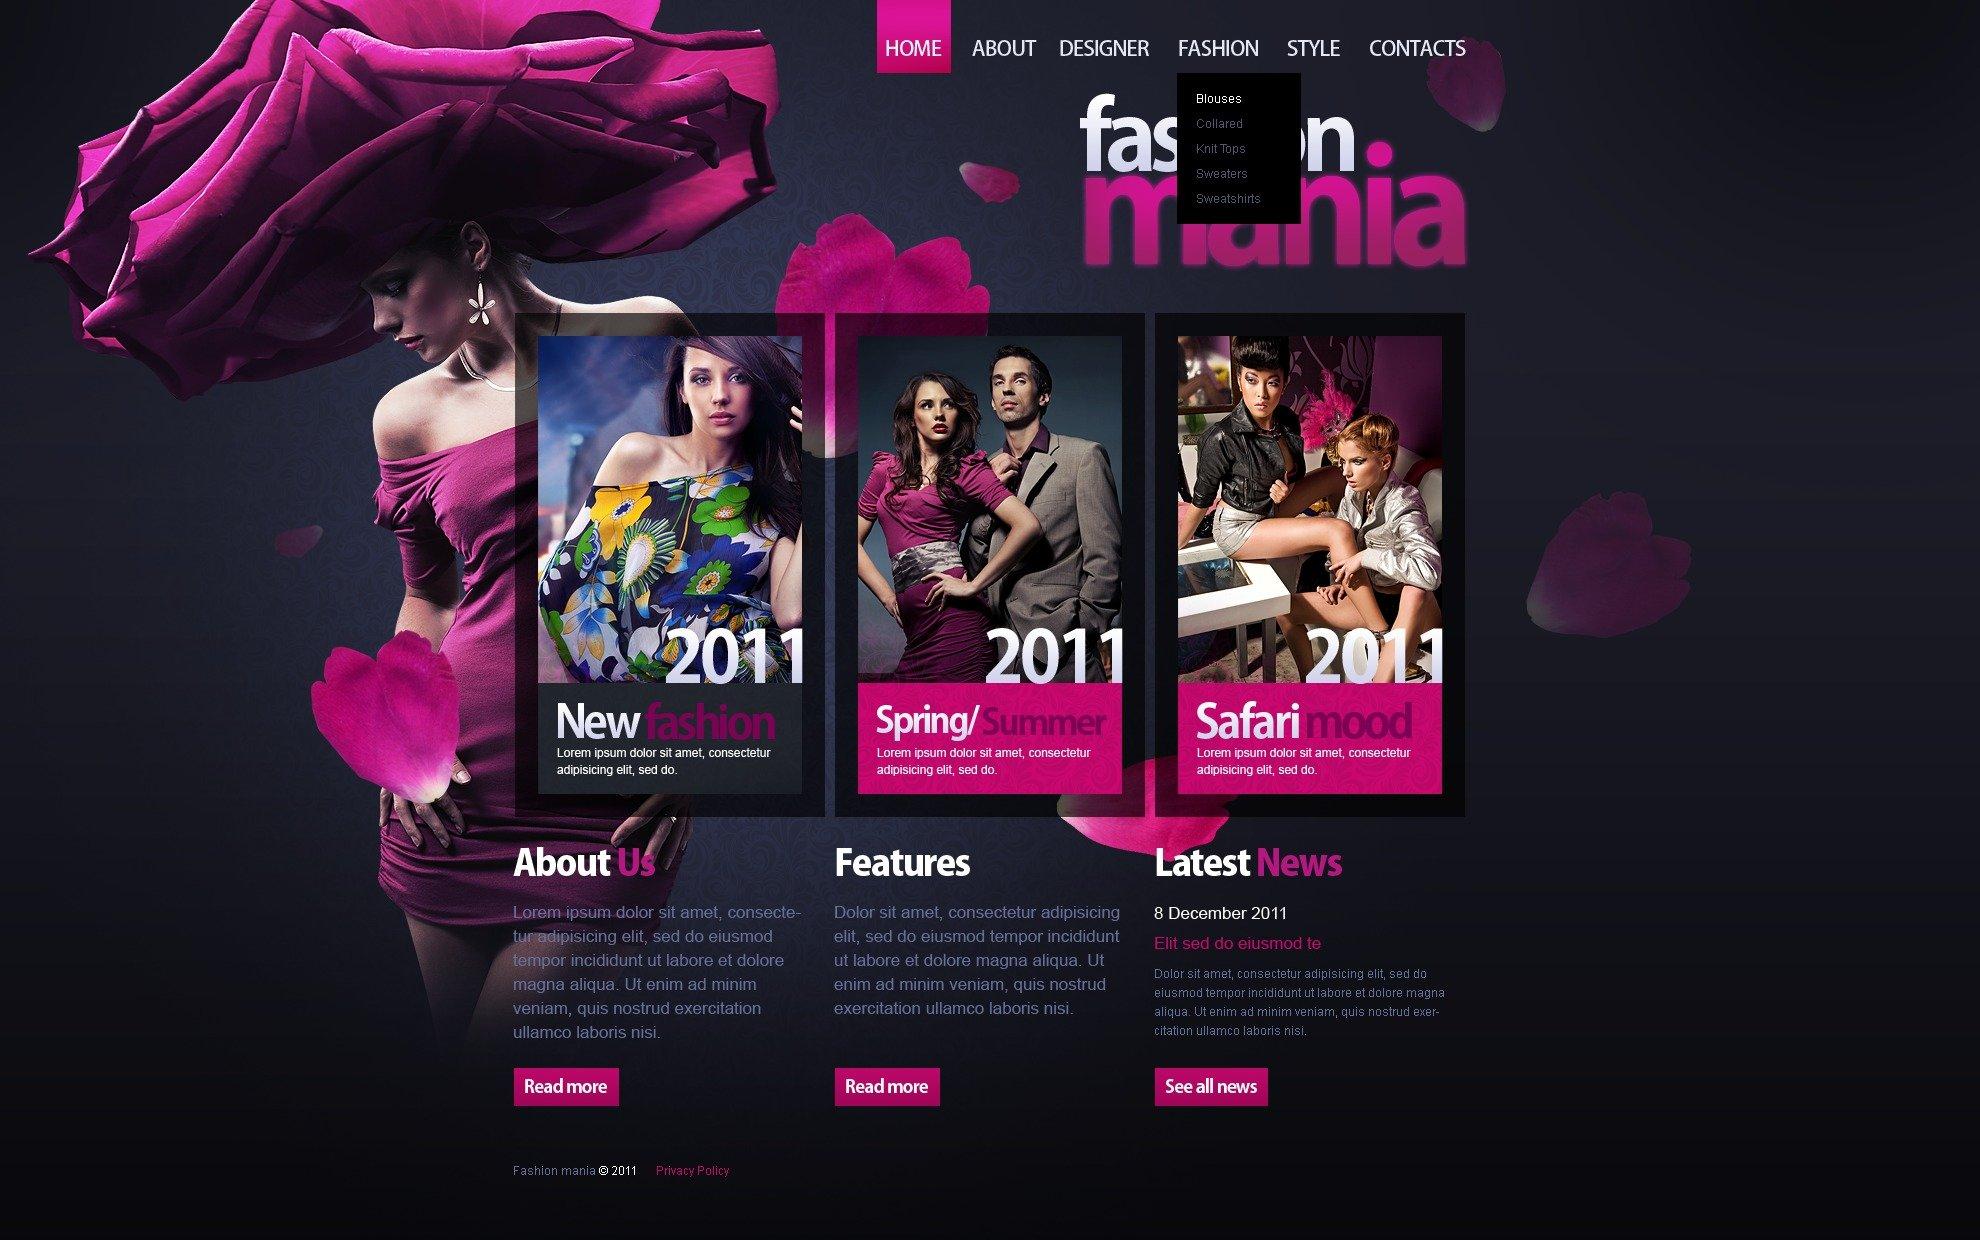 6 Affordable Fashion Websites You Should Bookmark Now - Savvy European fashion web sites